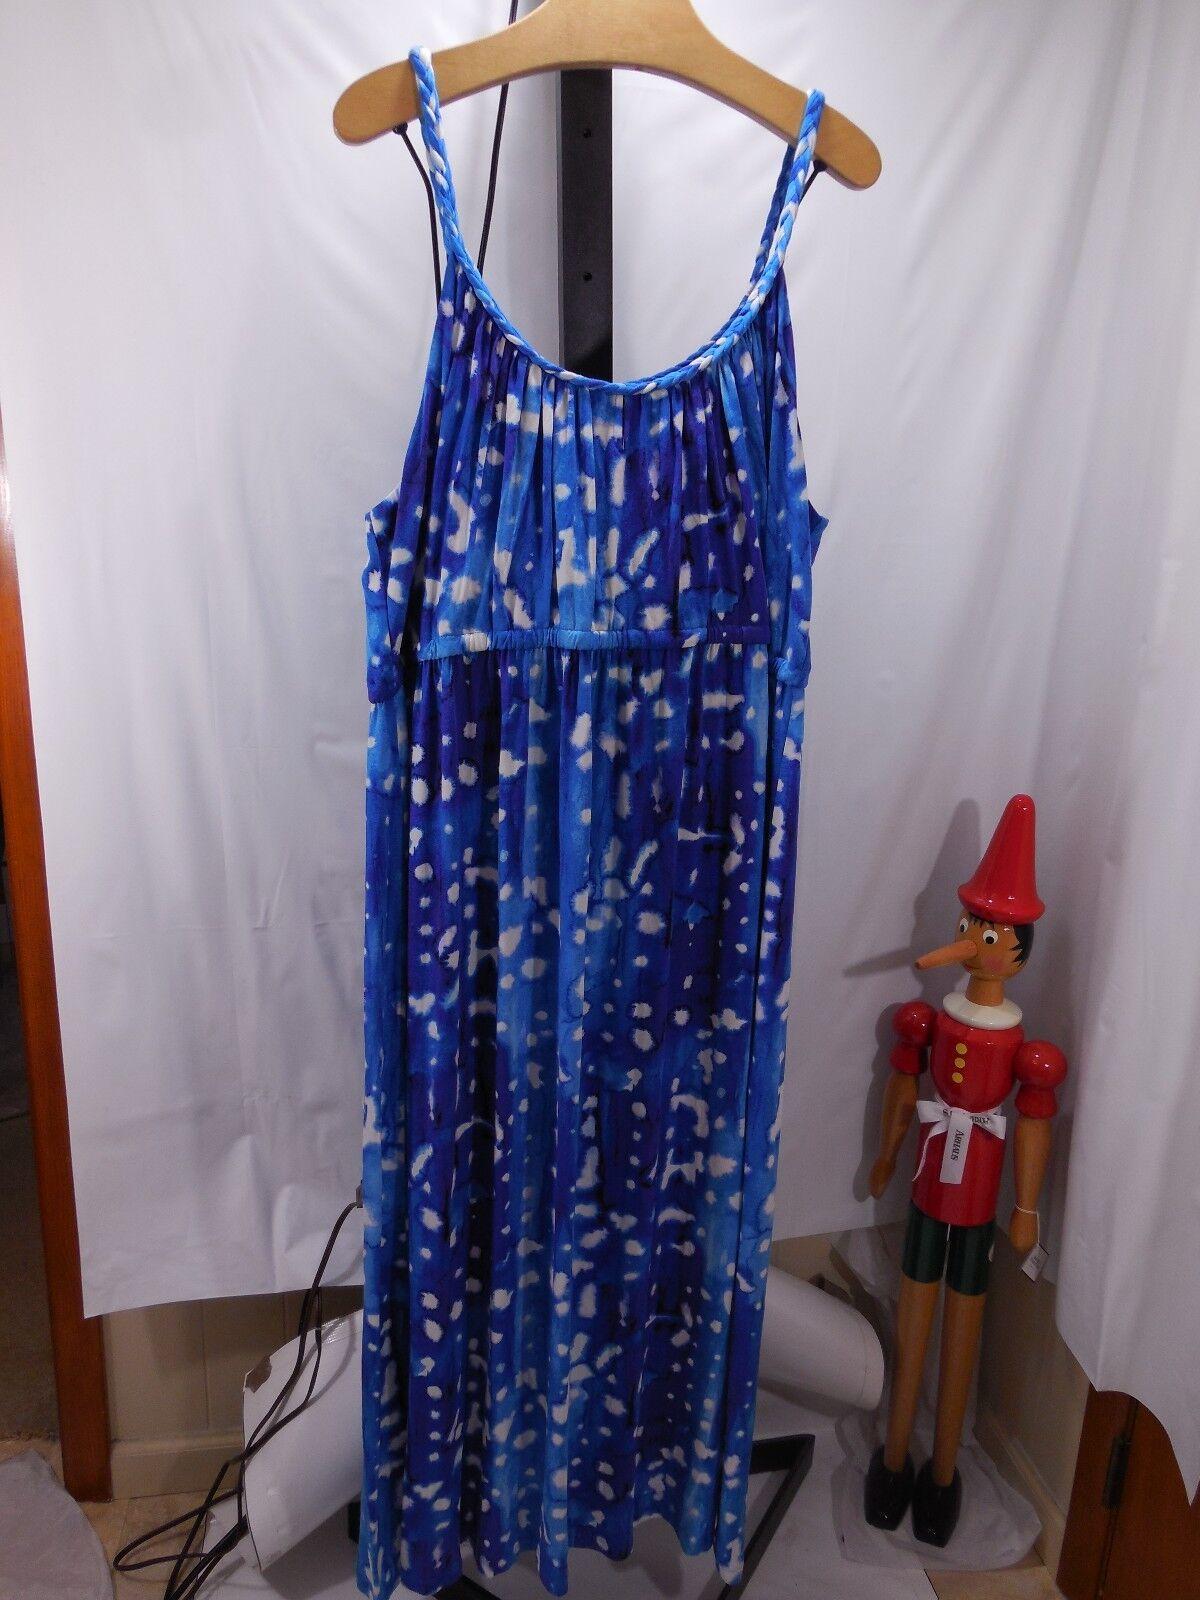 WOMANS LONG STRETCH JERSEY DRESS WATER COLOR PRINT CYNTHIA ROWLEY PLUS 1X 2X